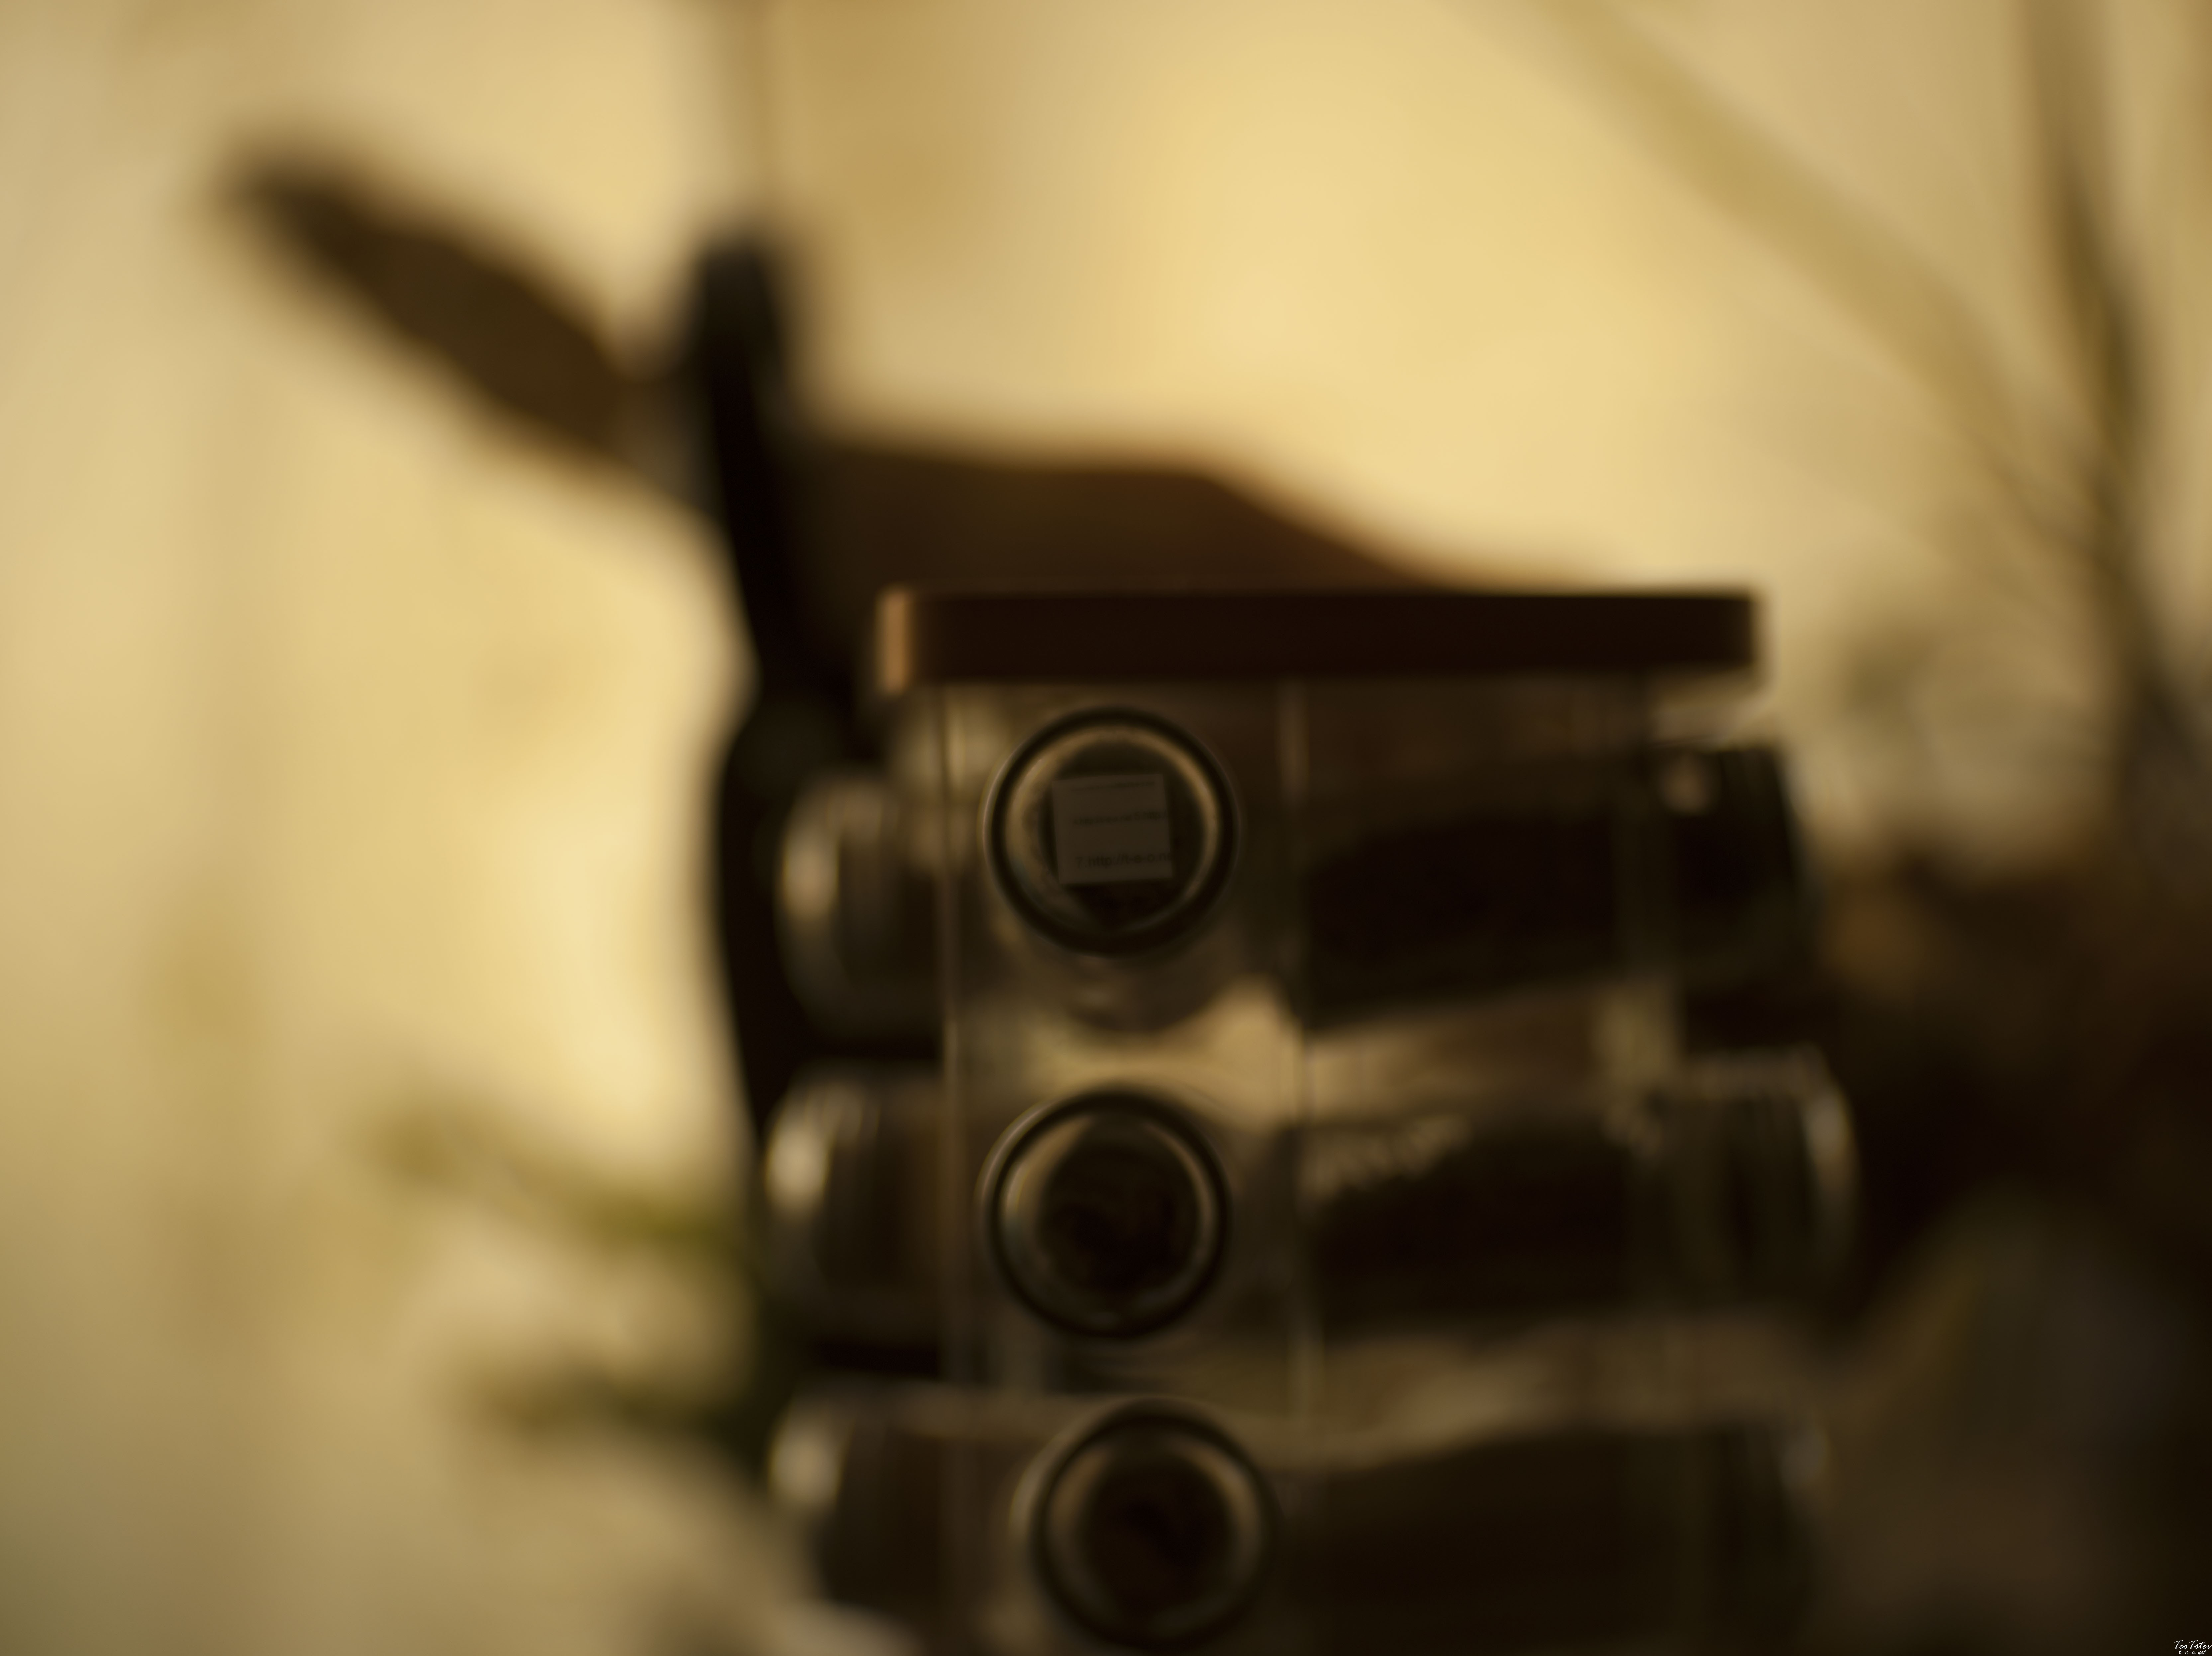 Russian Lens 35KP 140mm MF f1.8